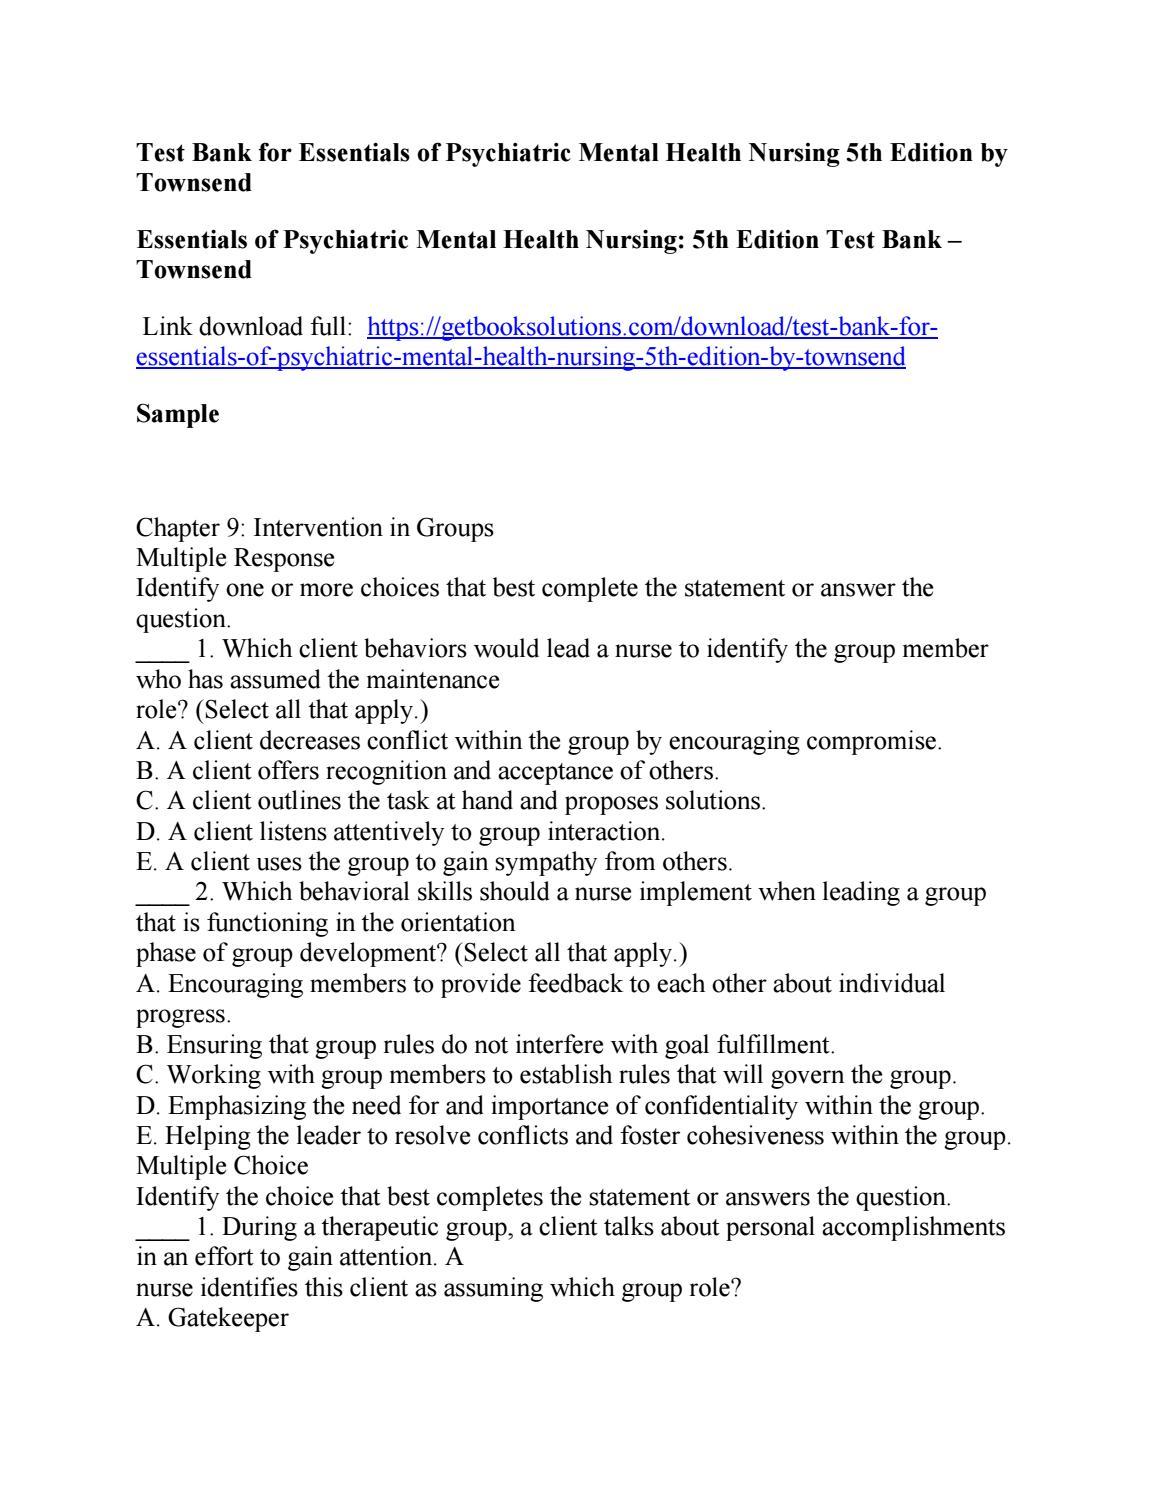 Development dissertations